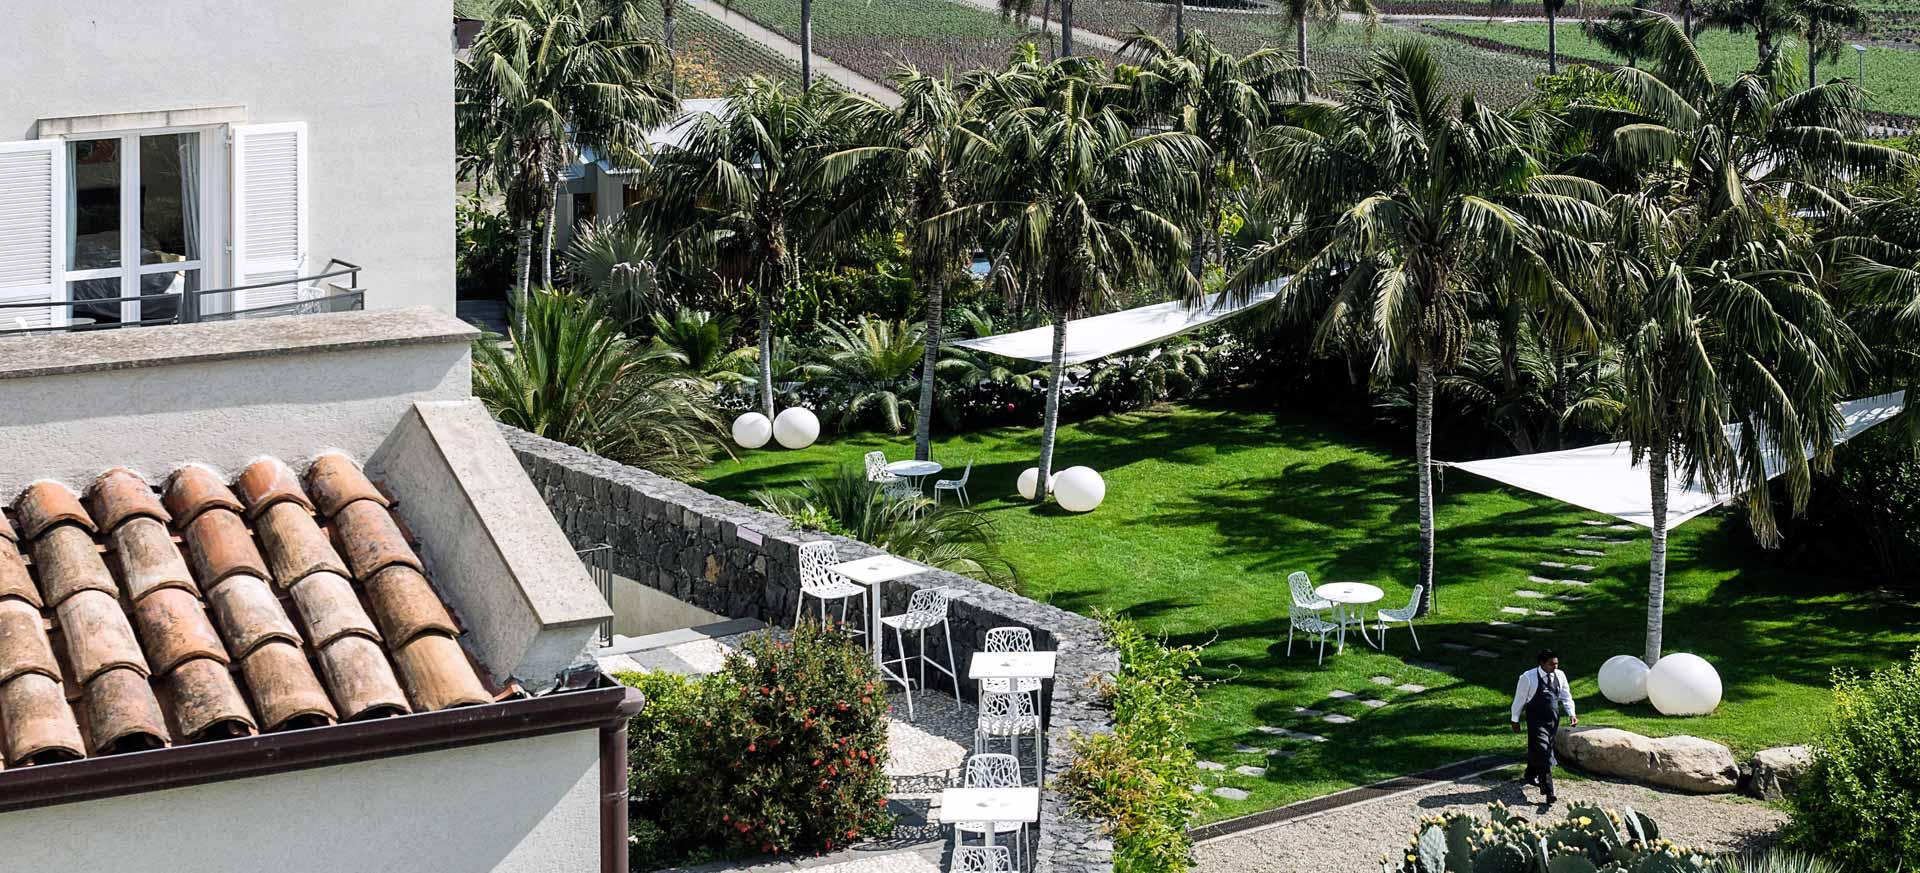 sicily luxury boutique hotel etna acireale hote italia